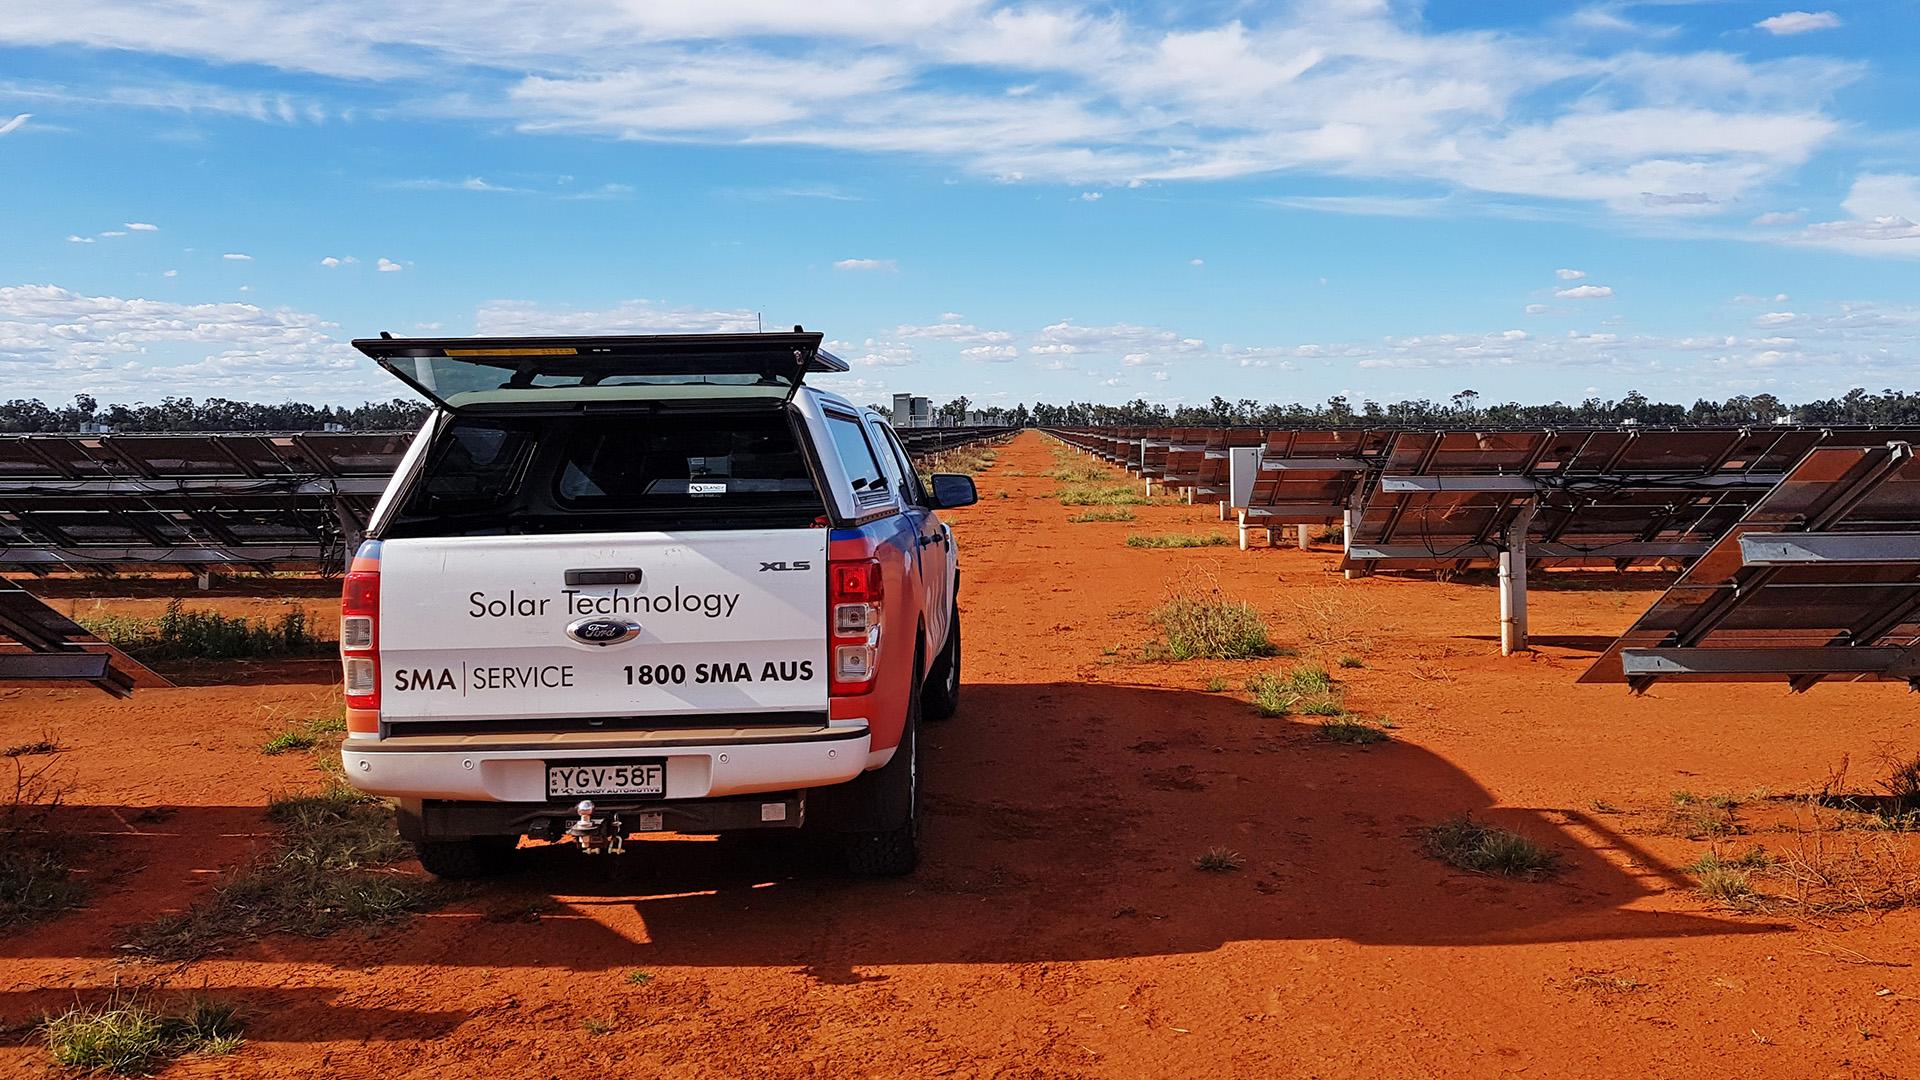 Zurück am Netz: SMA Lösung sichert Solarerträge in Australien